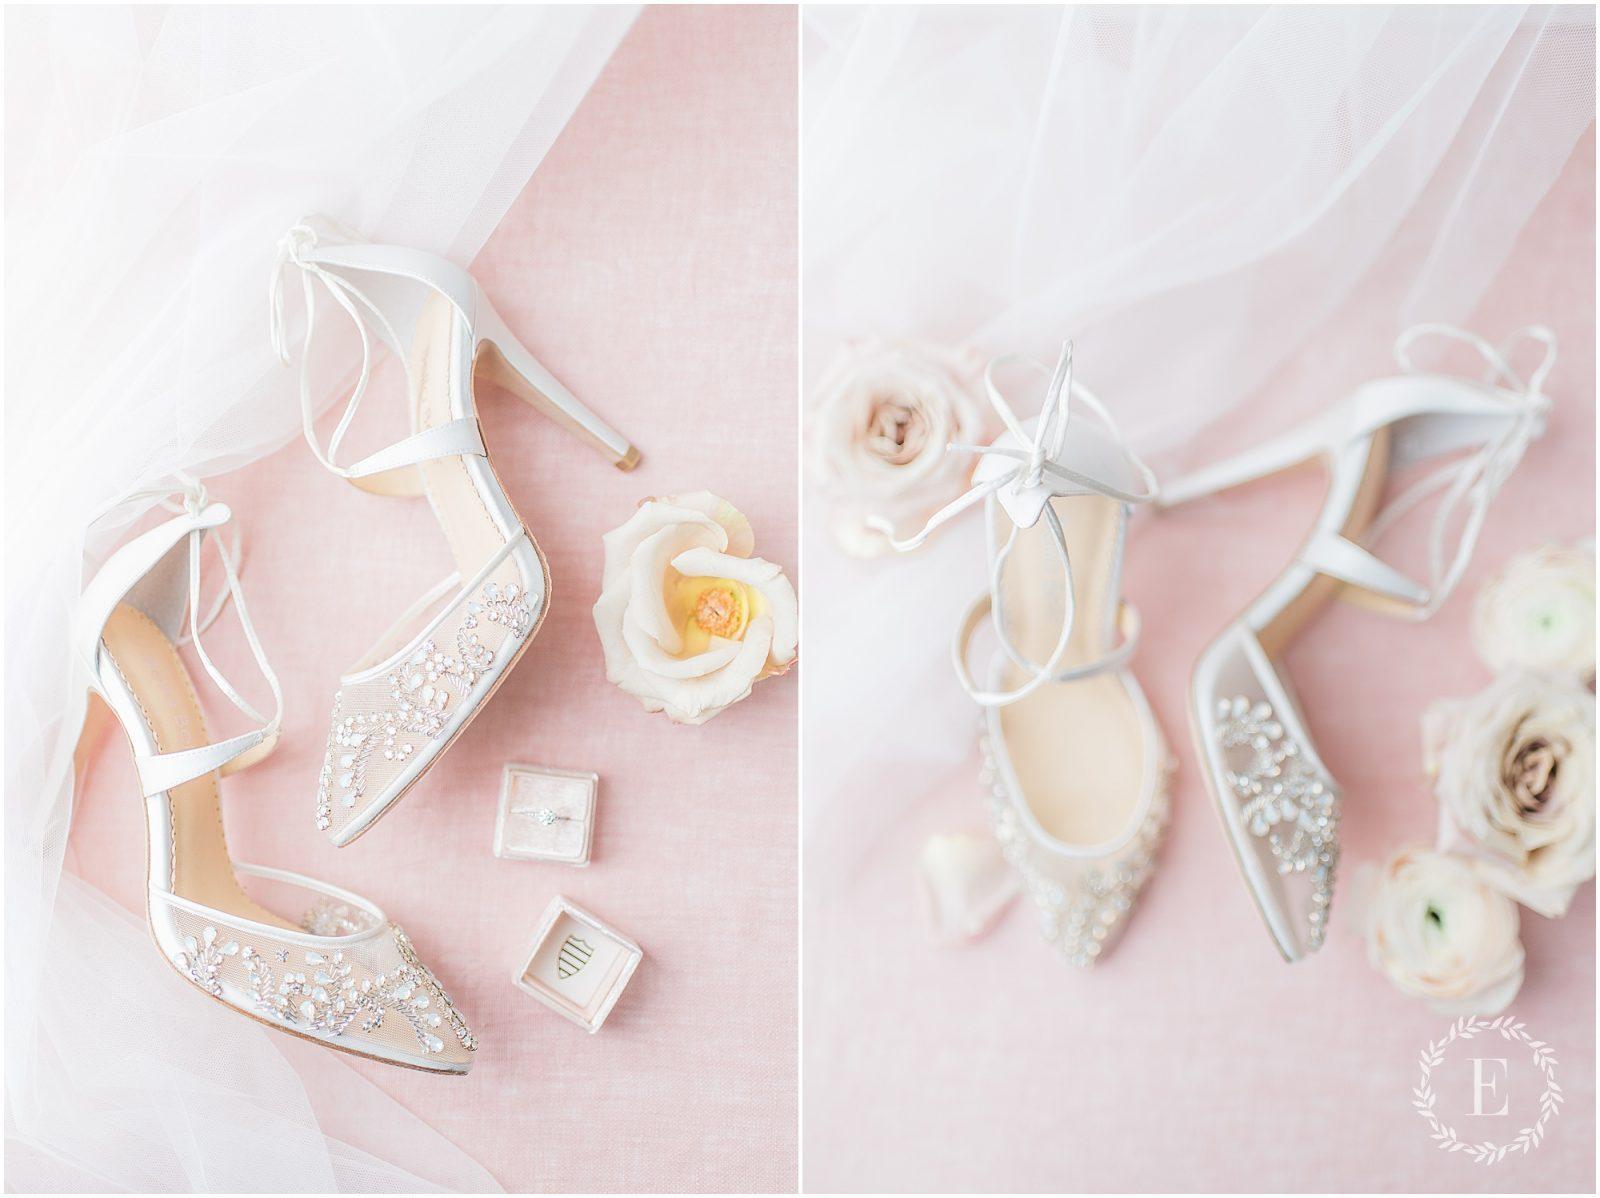 39 - Bella Belle for Fairy Dreams Bridal - PhotosbyEmmaH 2019.jpg